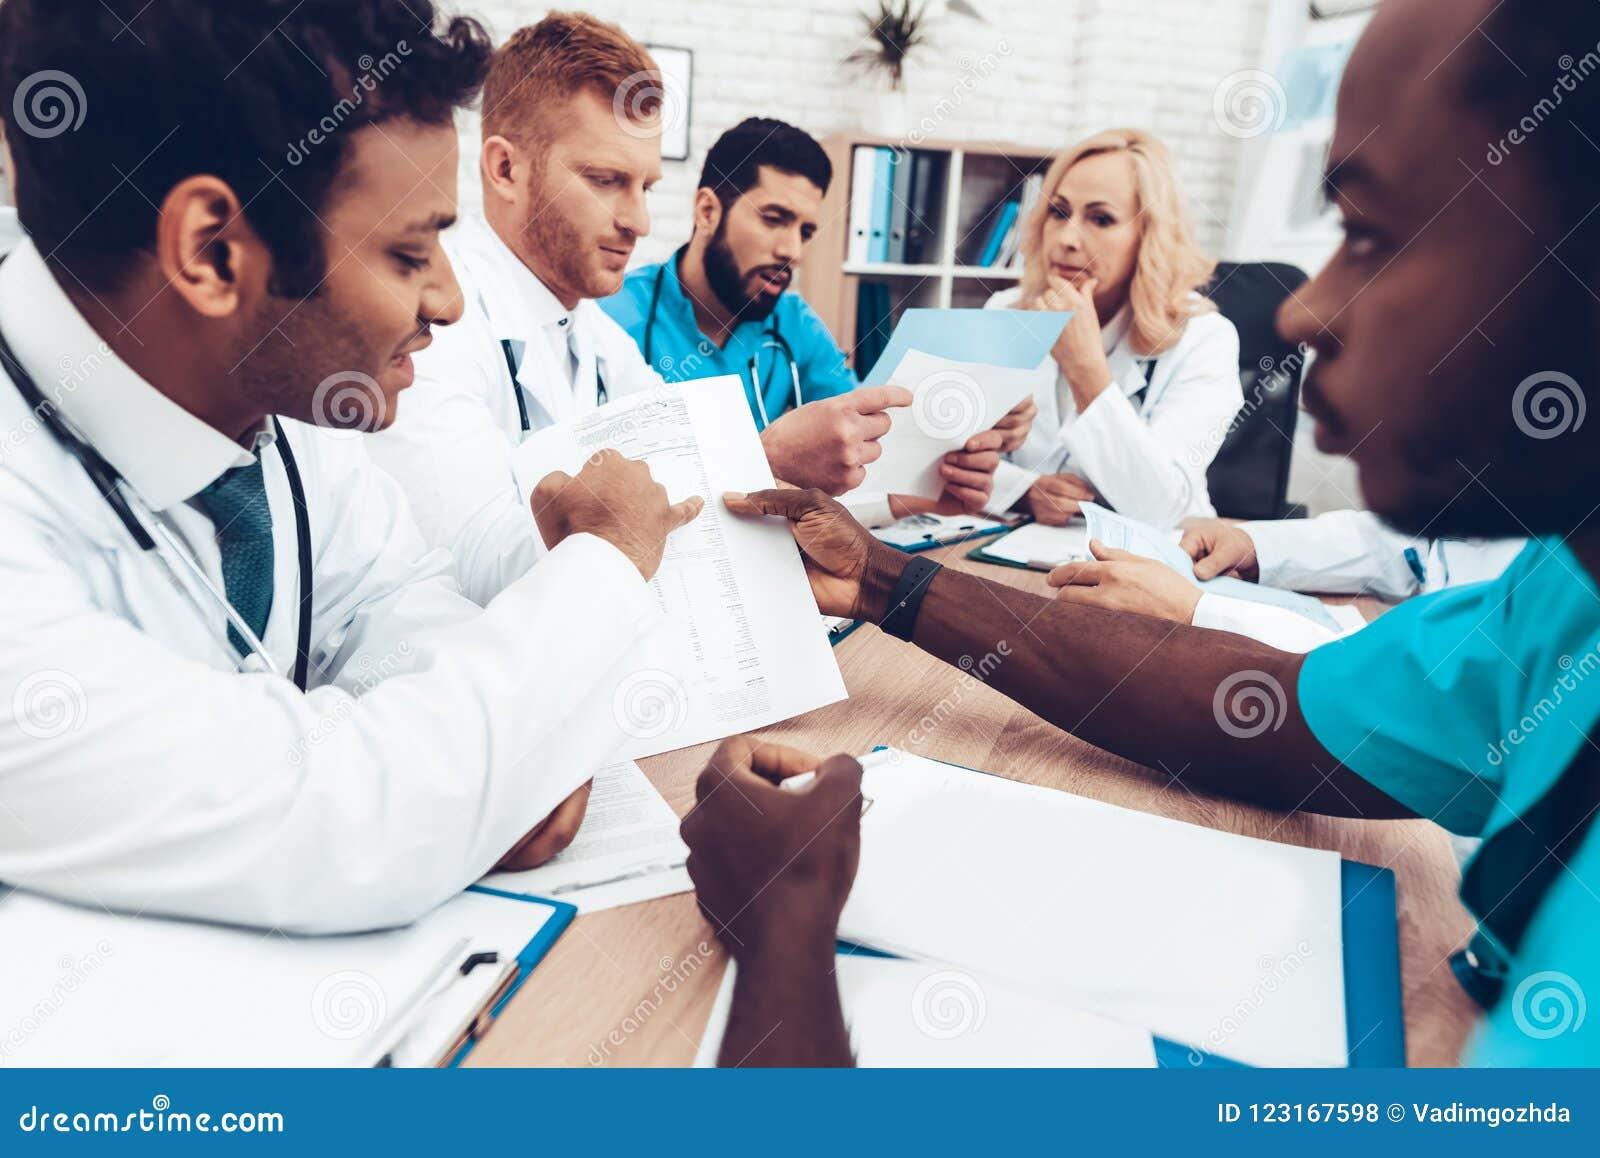 Multinational Doctors Group Diagnostic Meeting.